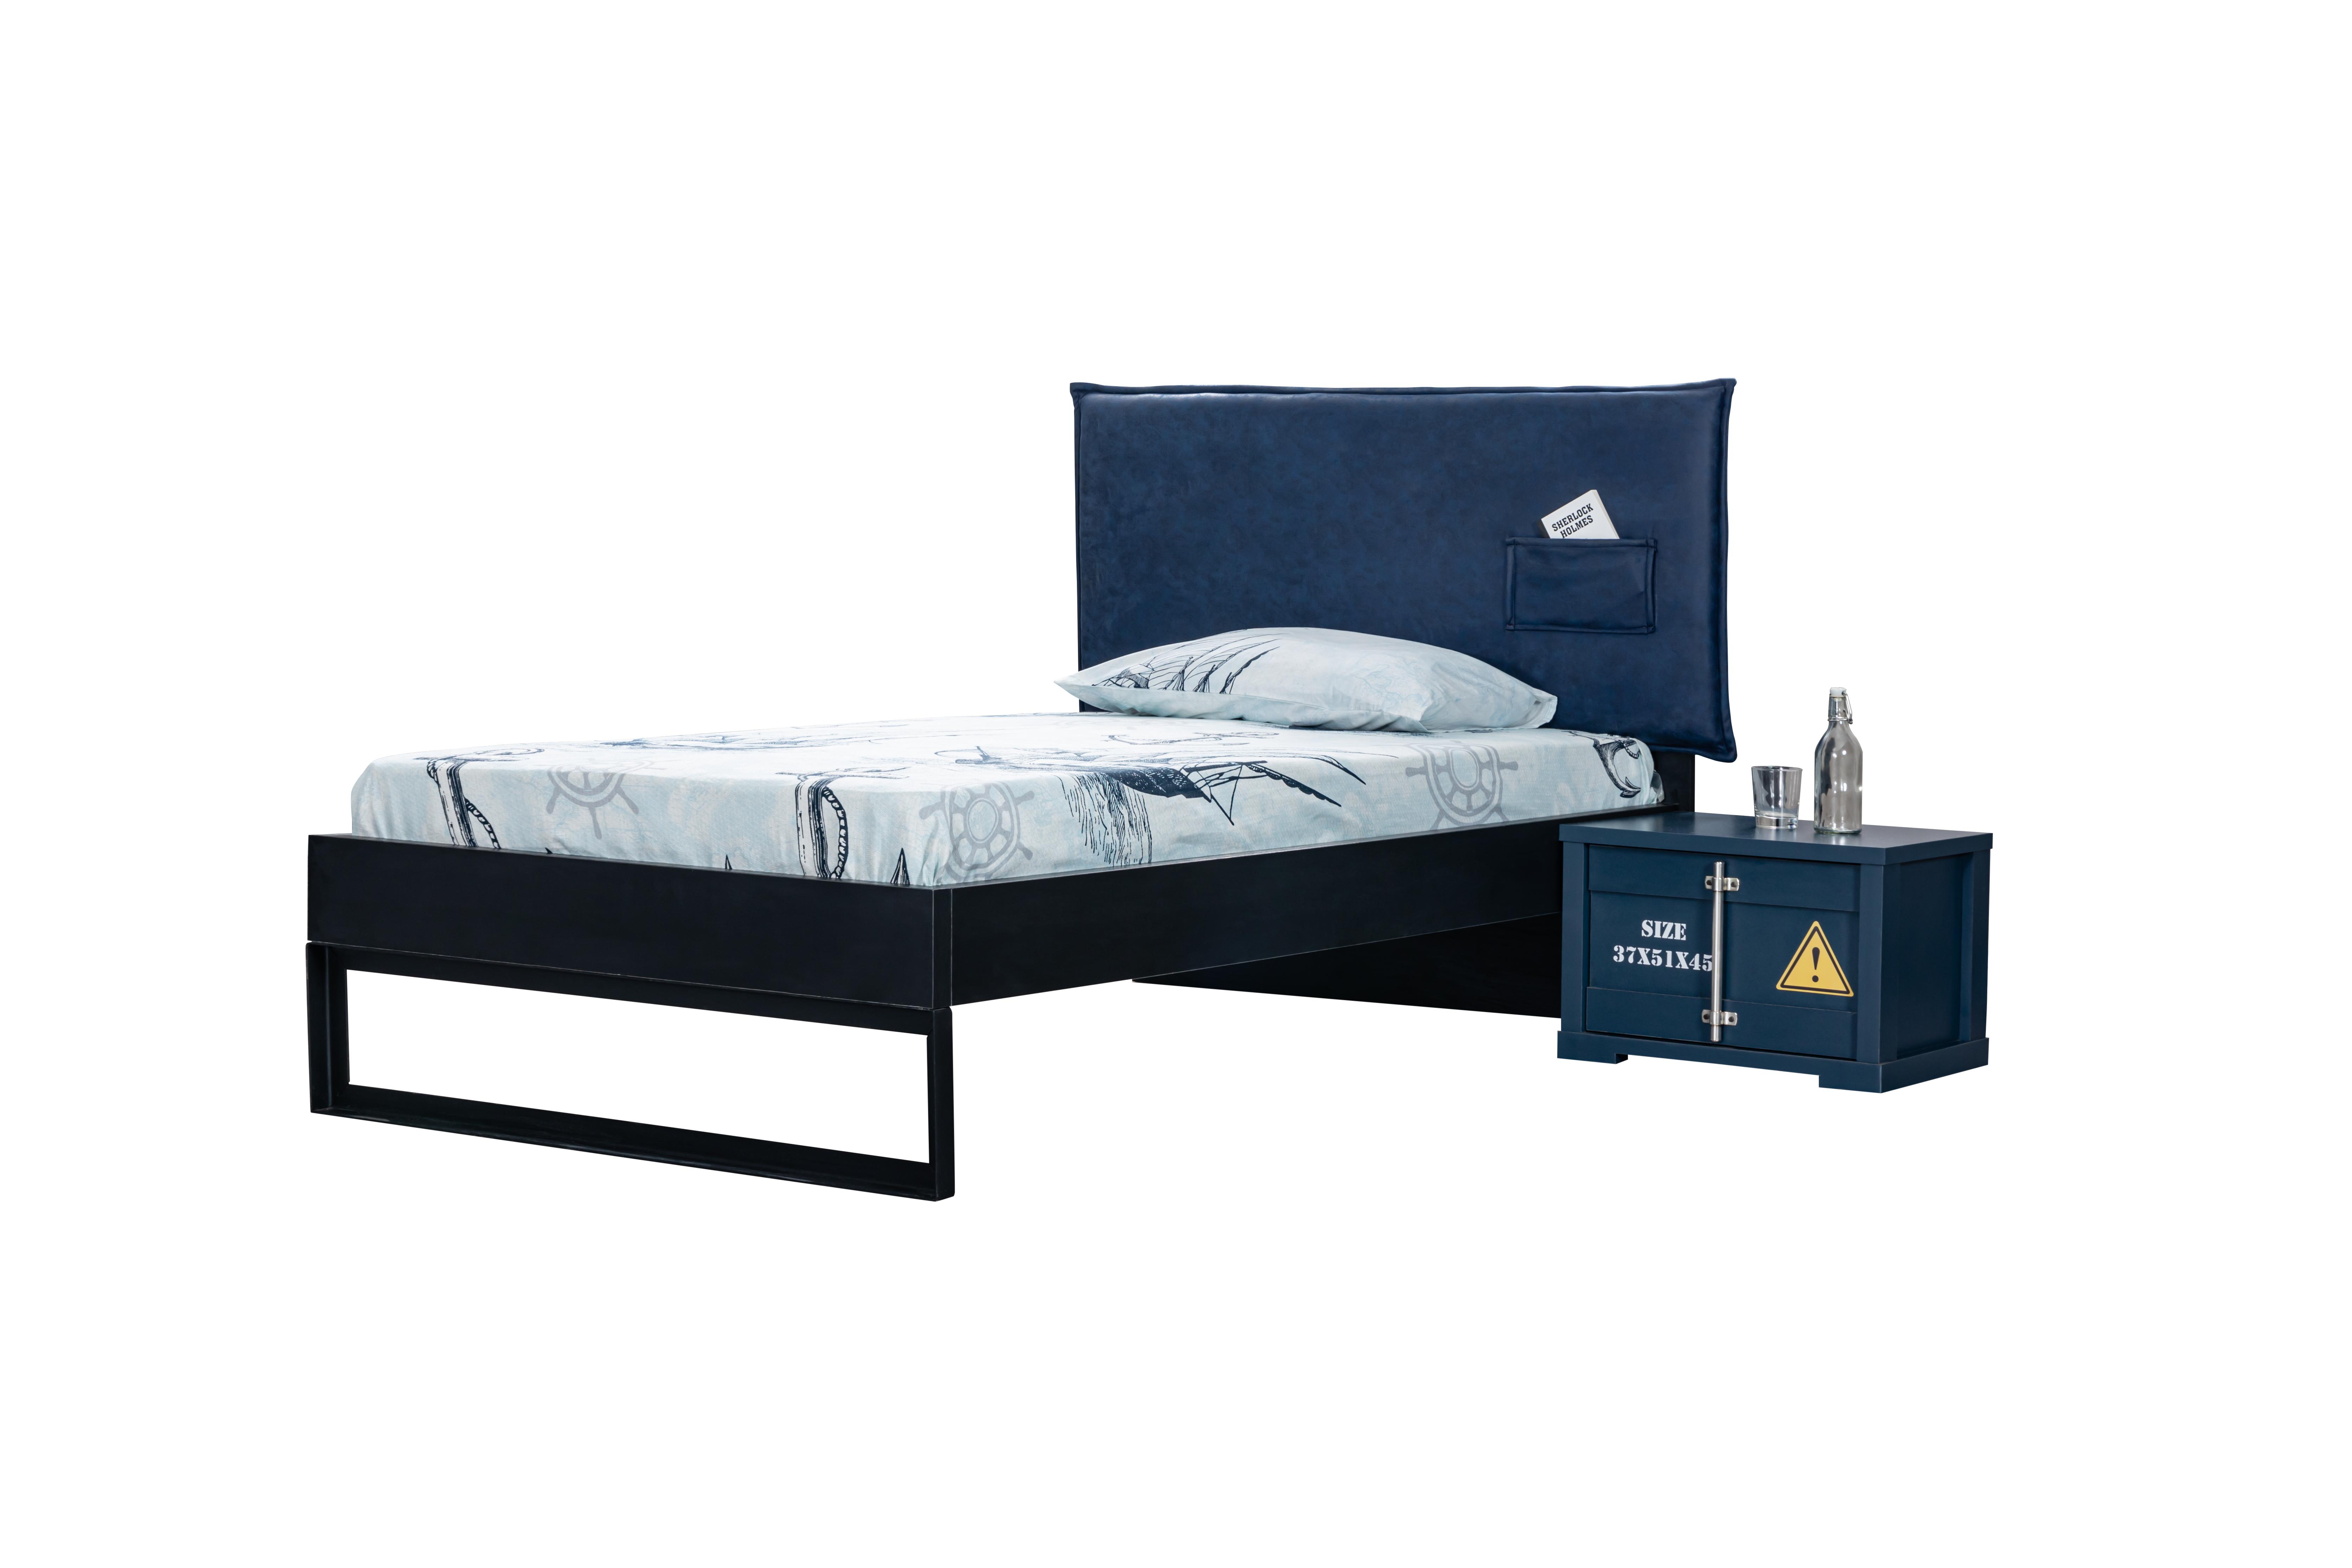 Odacixi Jugendbett Container mit Nachtkommode